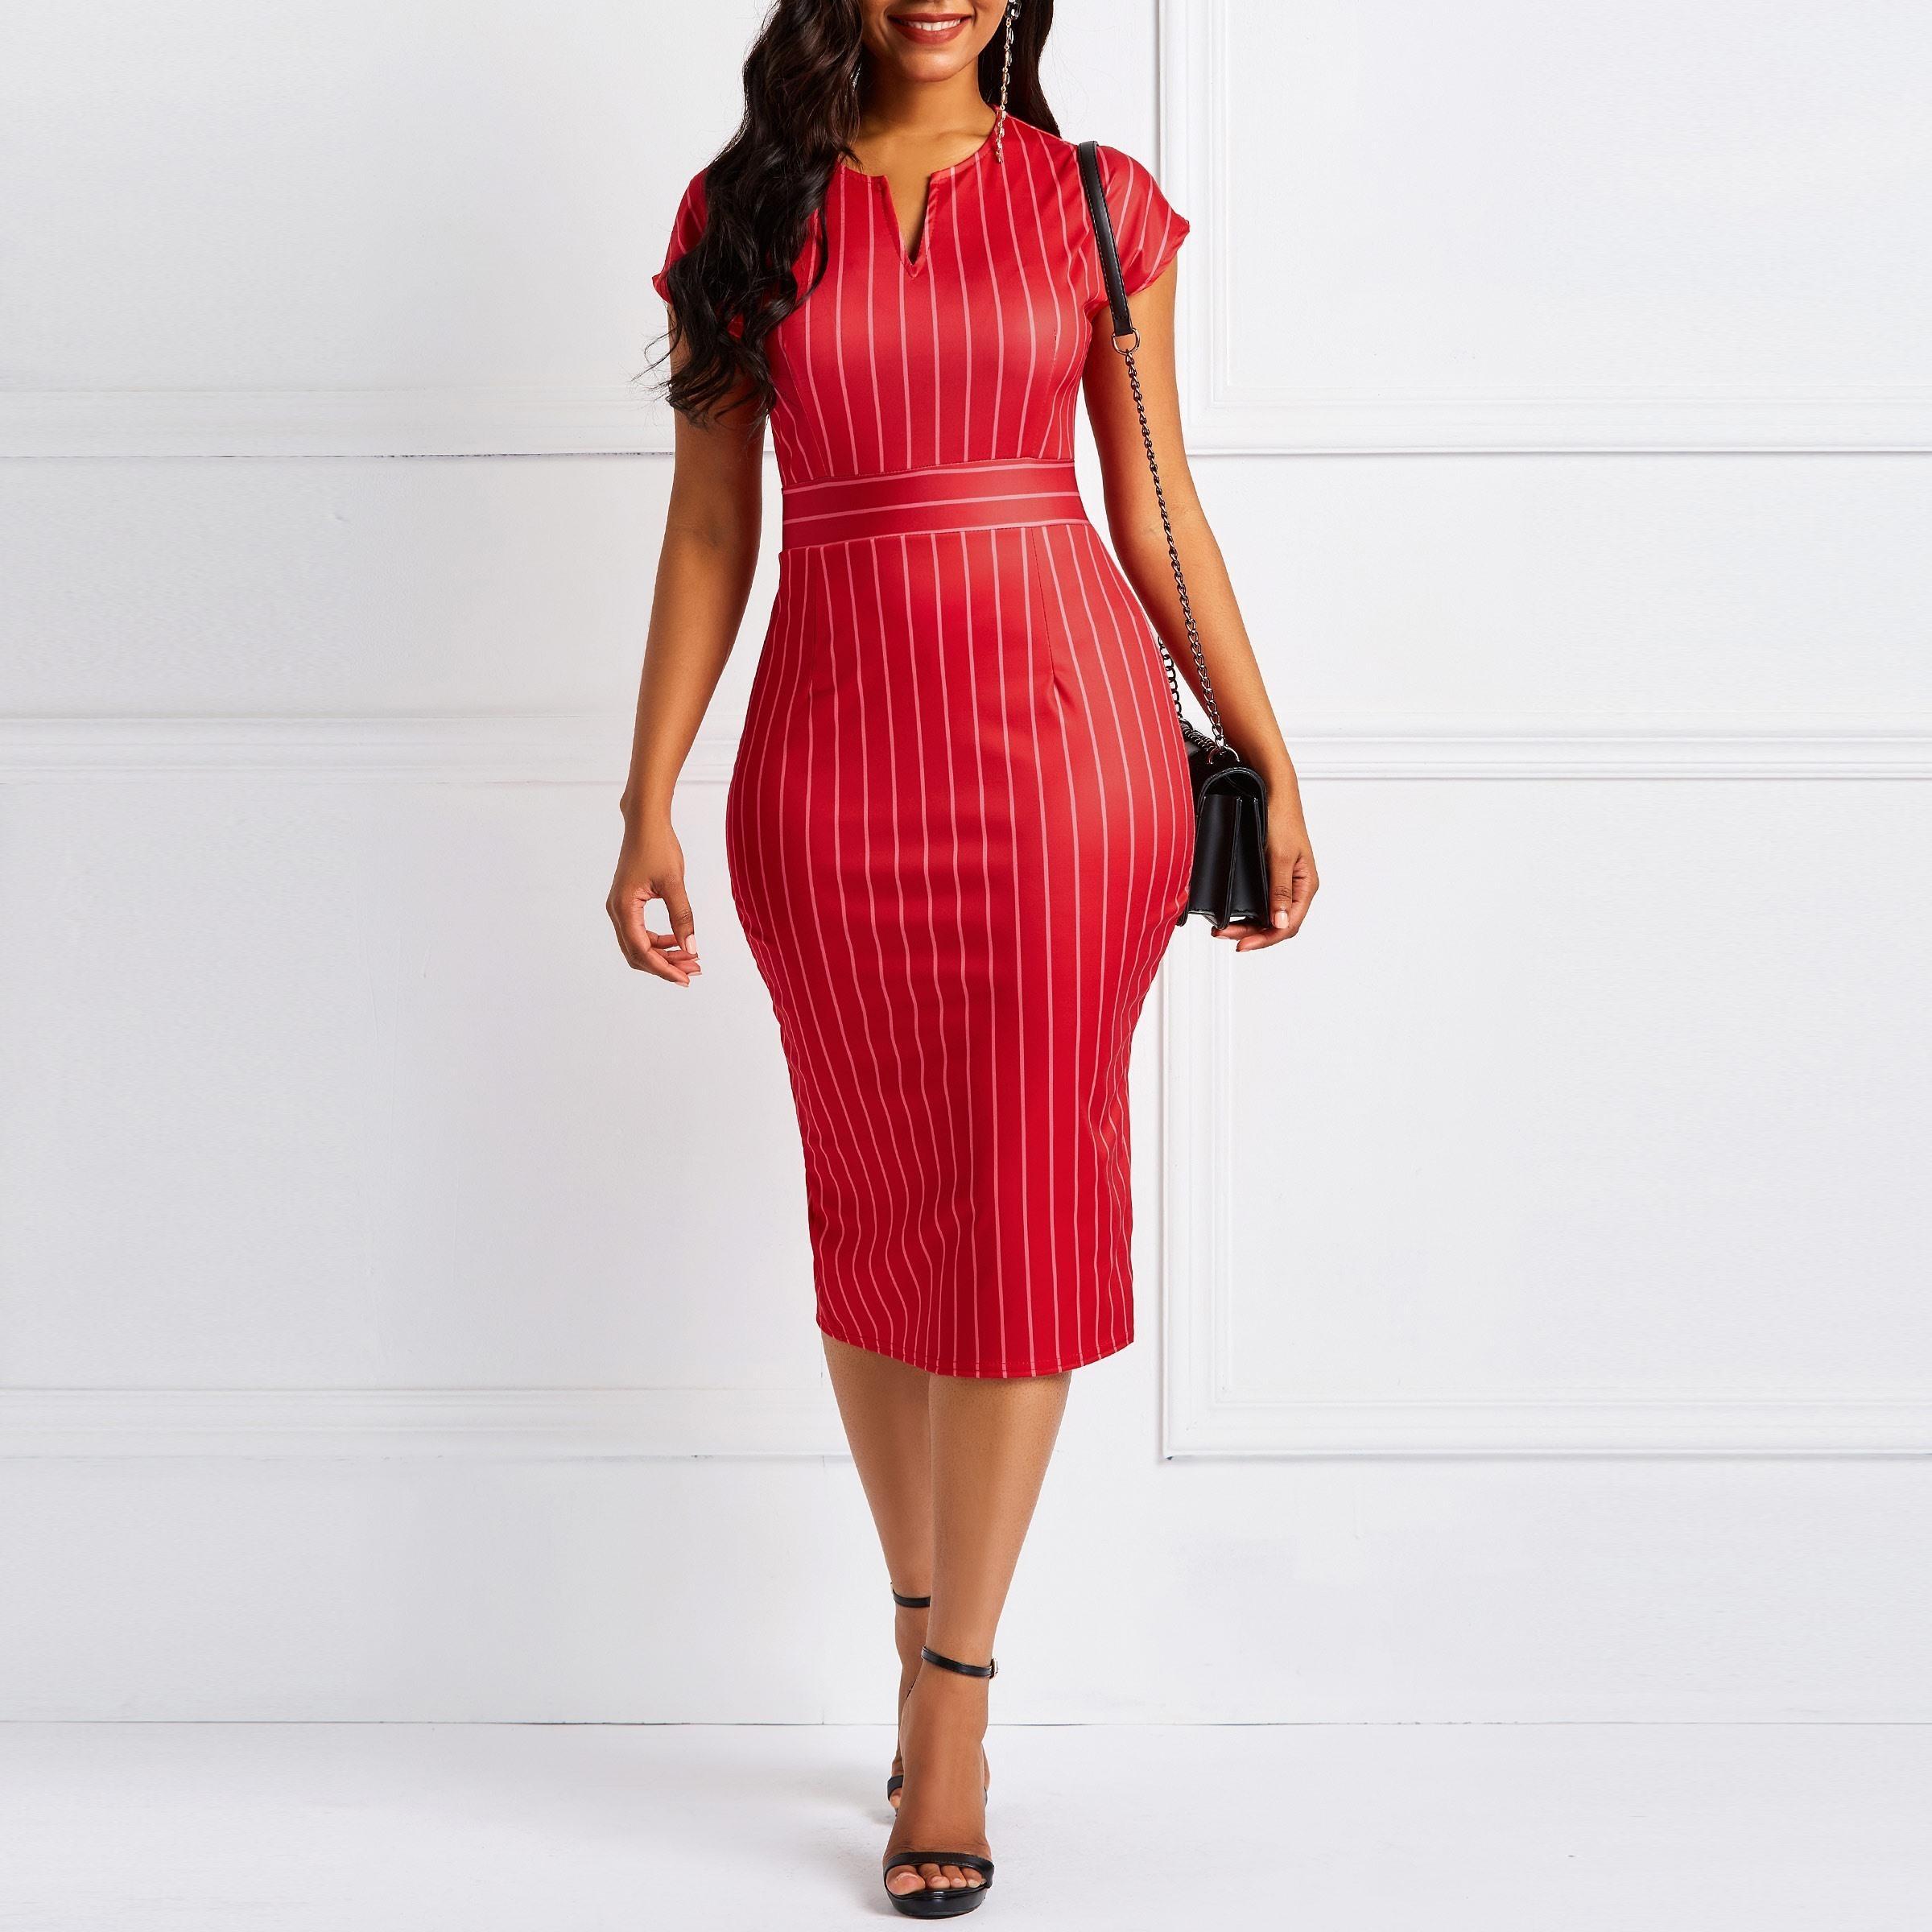 0dc7185a5b4 2019 Clocolor Office Ladies Red Stripe Dress Women Bodycon Vintage Back  Split High Waist Summer Short Sleeve Female Pencil Midi Dress Y190427 From  Tao01